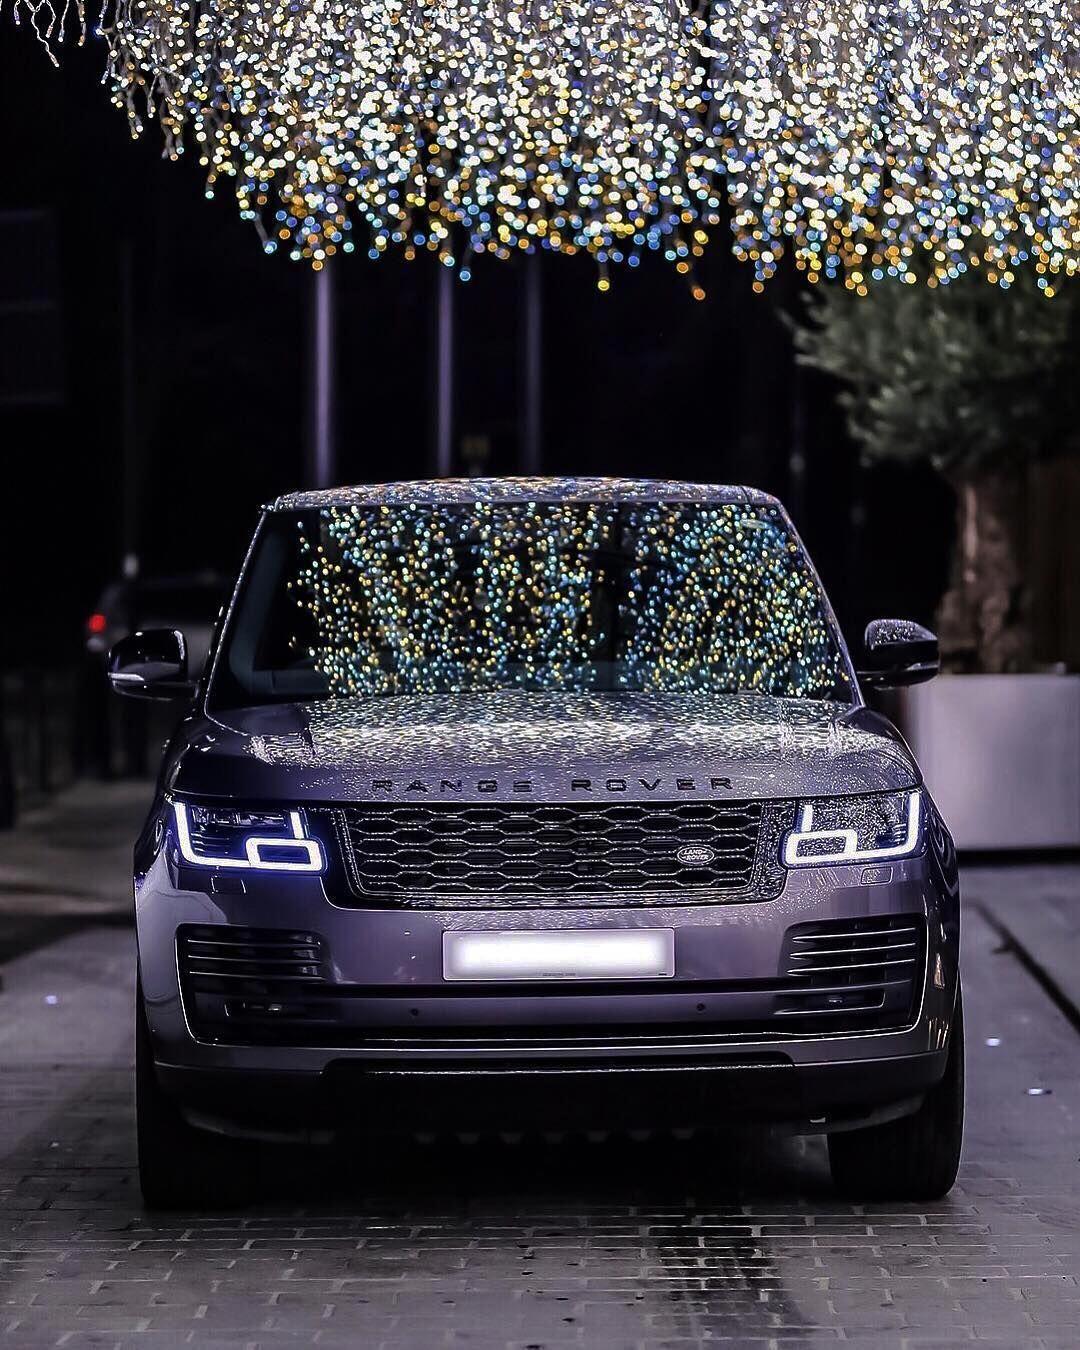 Range Rover Autobiography Rangerover Luxurysuv Suv Autobiography Luxurylifestyle Cars Luxury Cars Range Rover Range Rover Car Range Rover